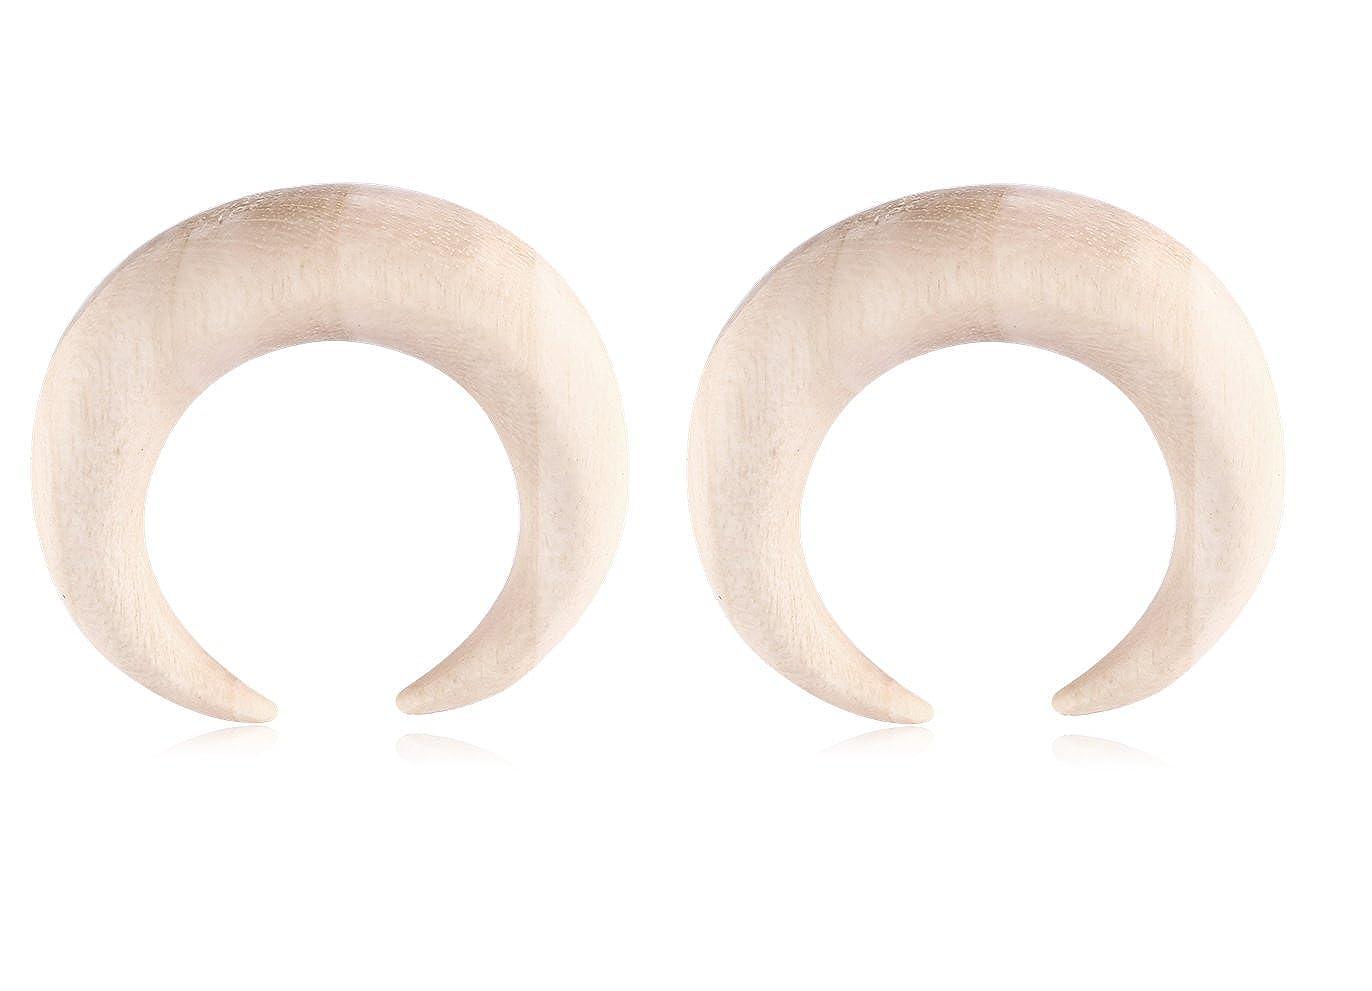 Amazon com: Holy Plug Body Piercing Jewelry Pair of 2 Wood